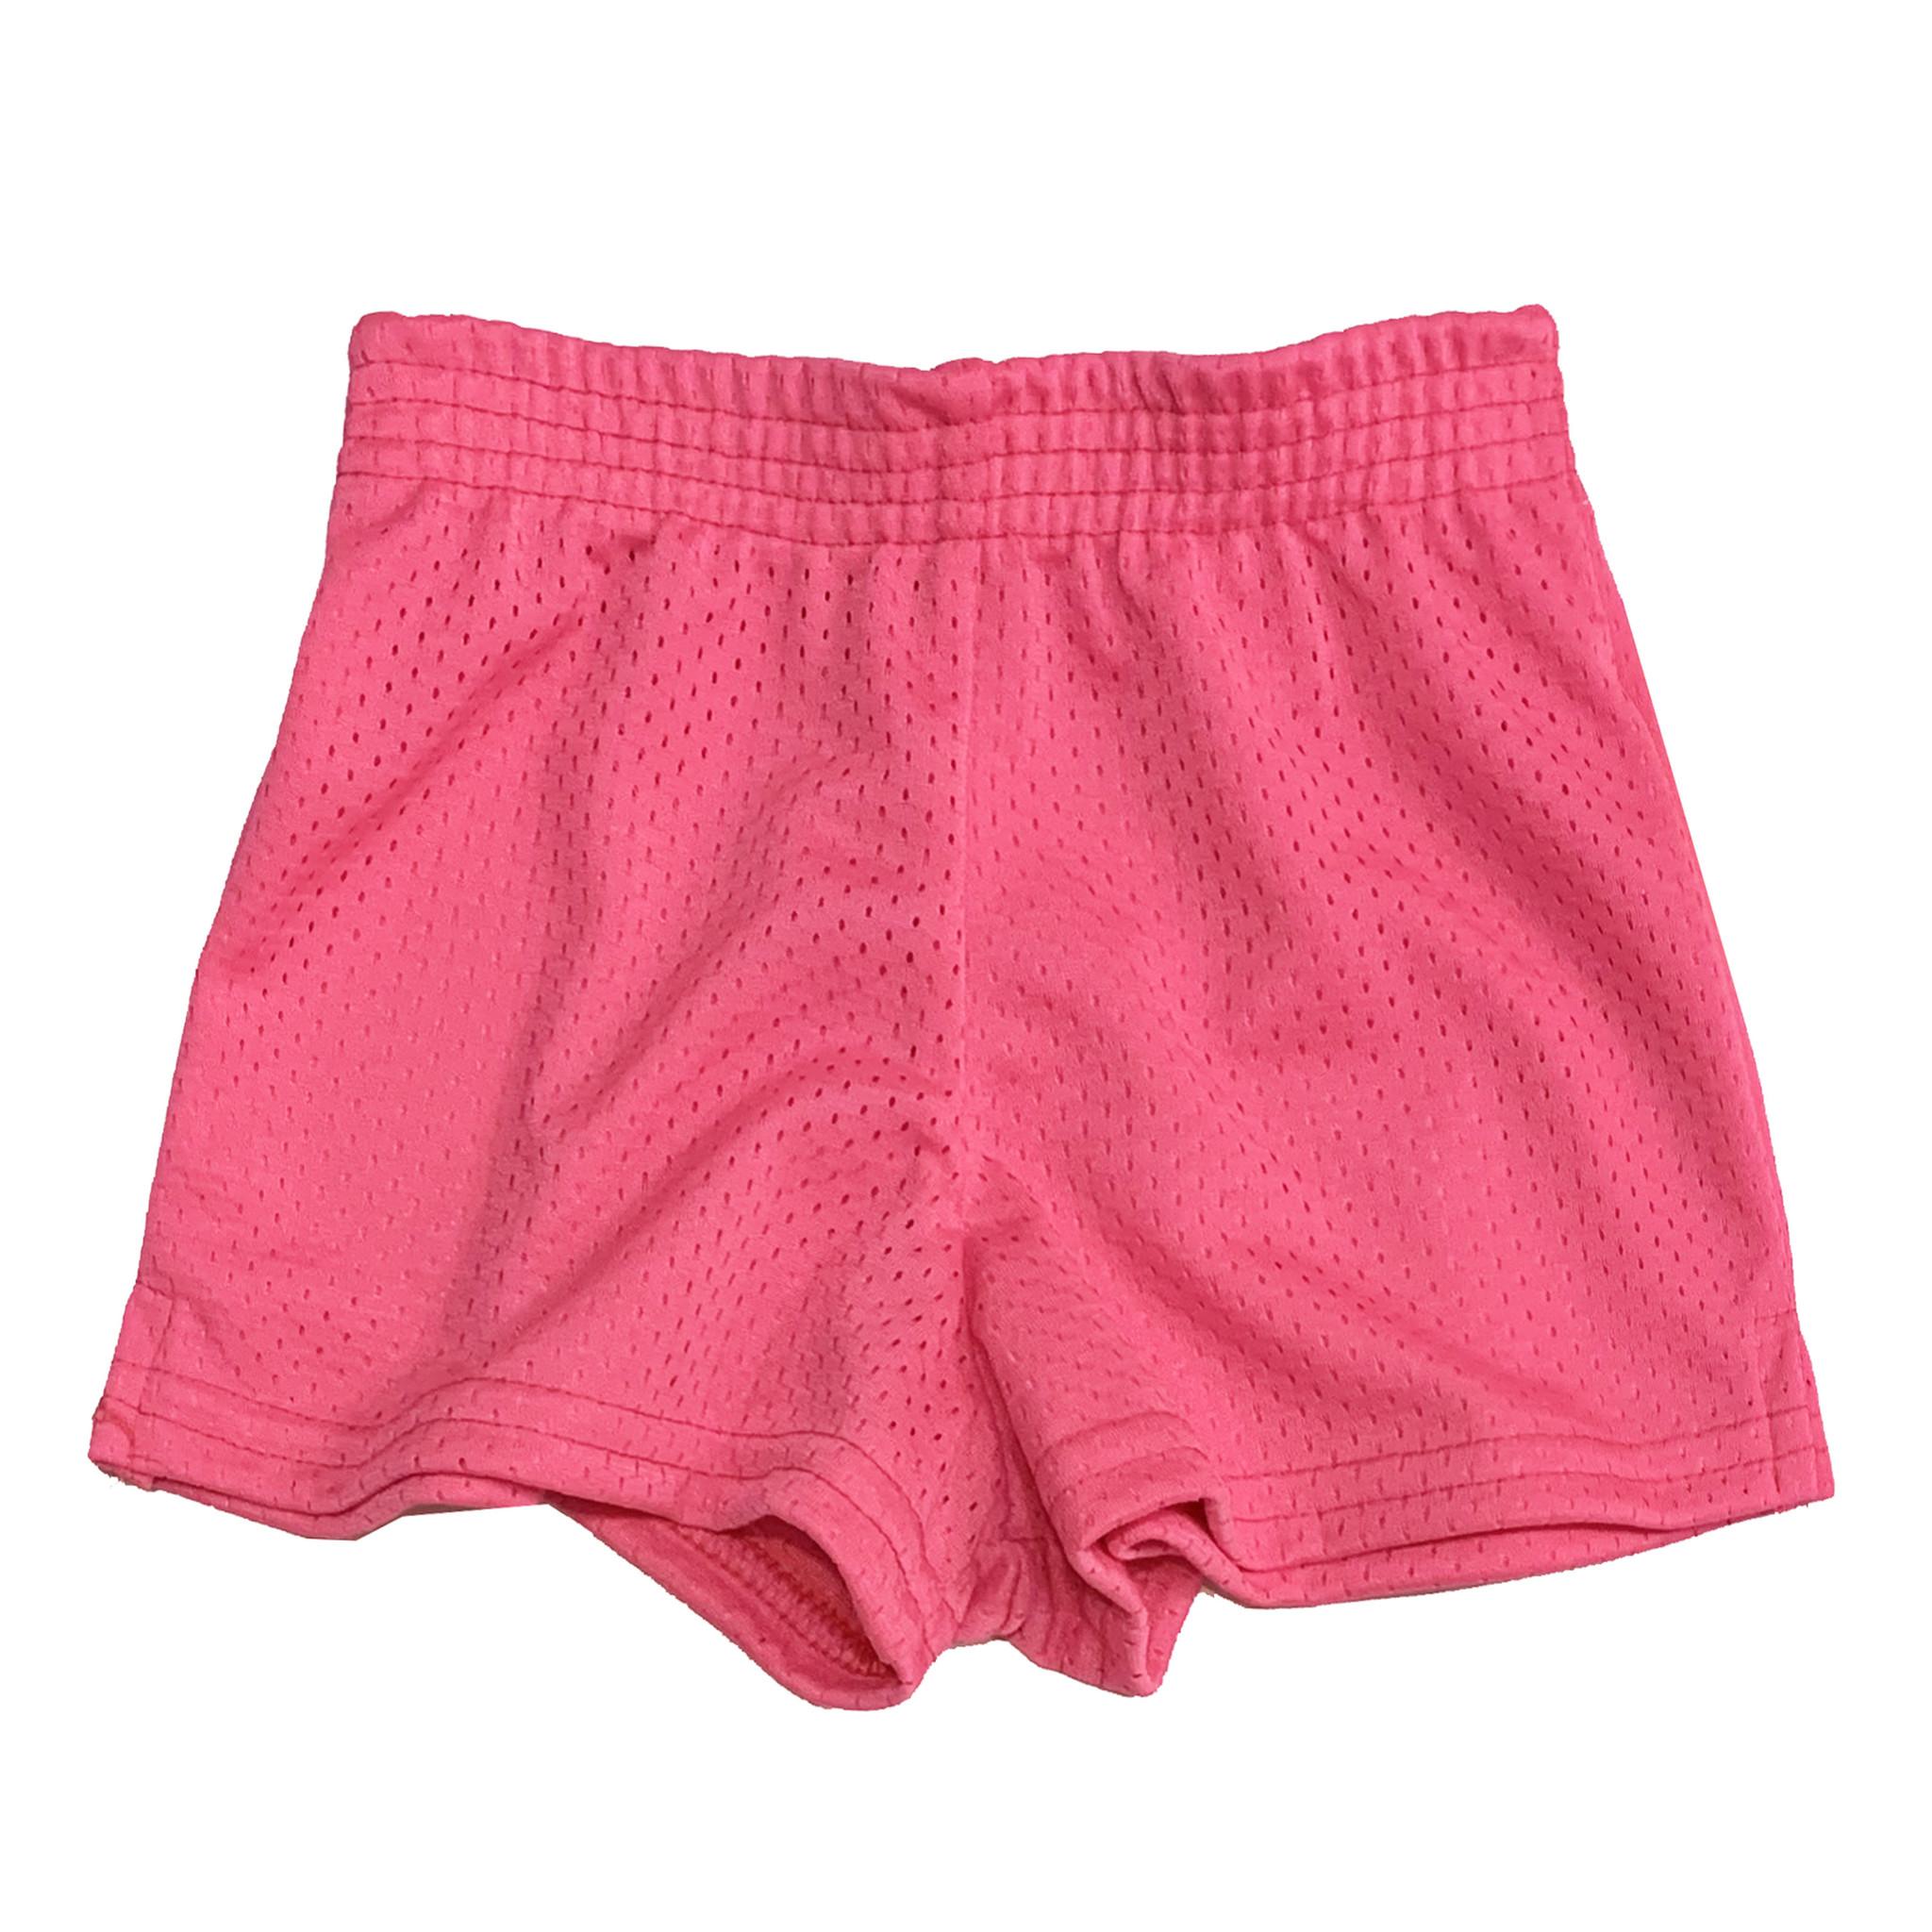 Dori Creations Neon Pink Mesh Shorts